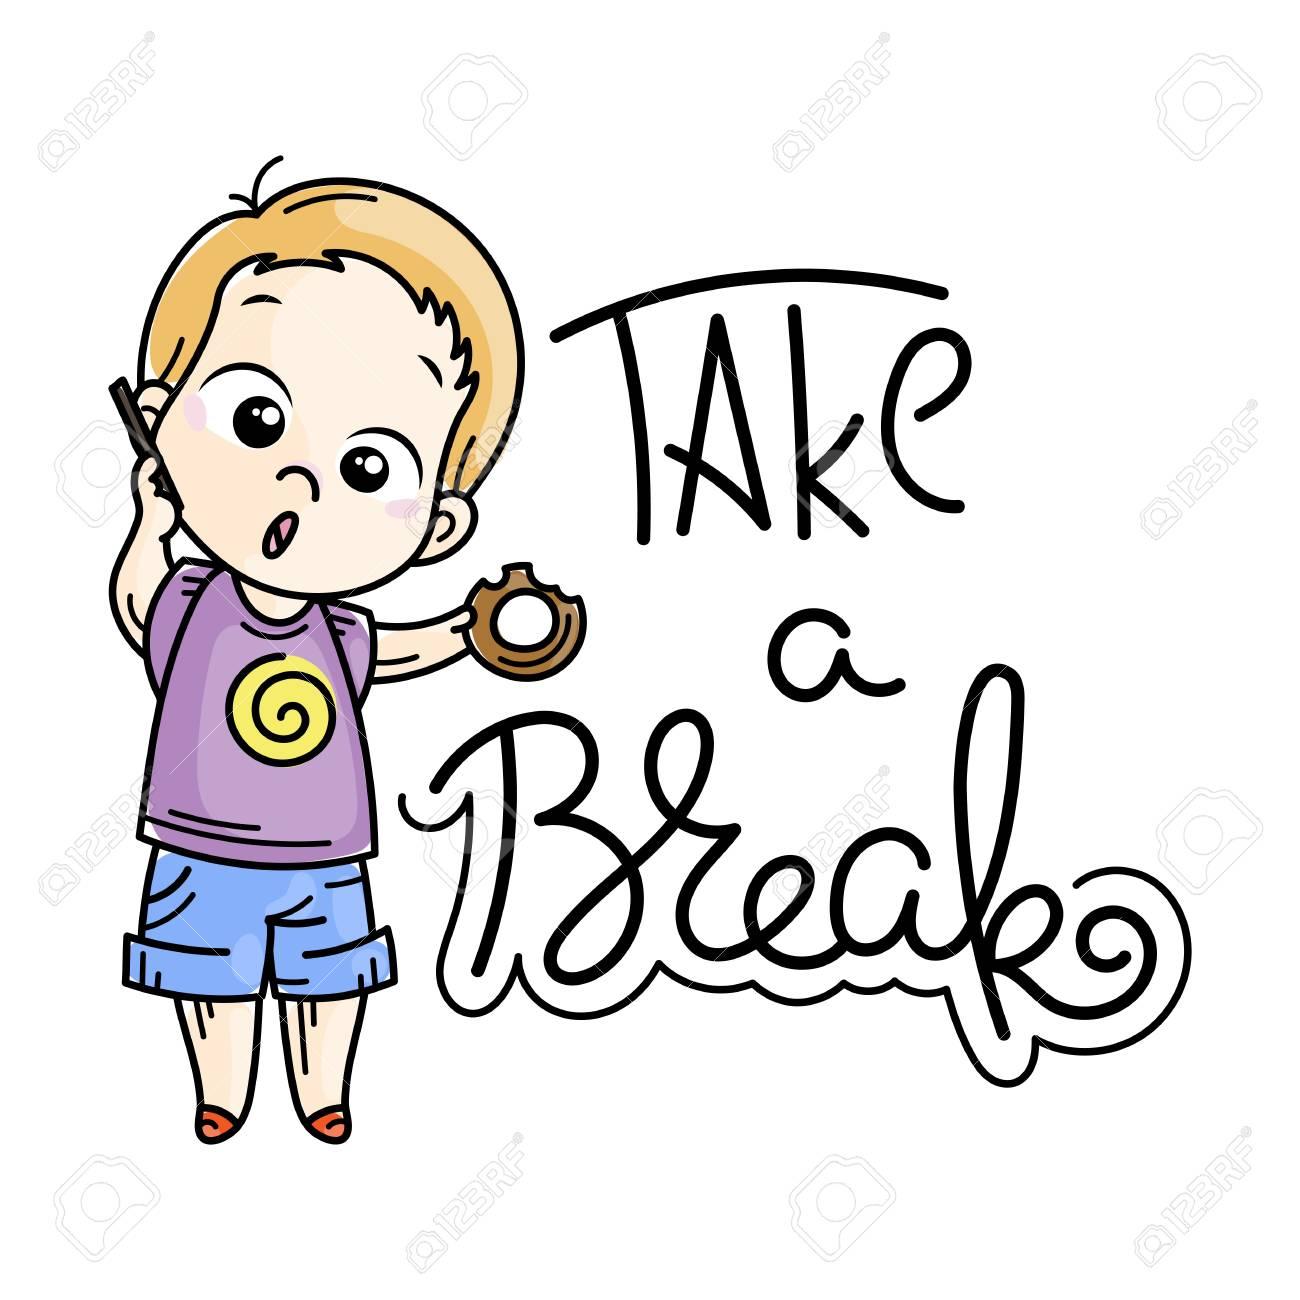 Take A Break Clipart Kids